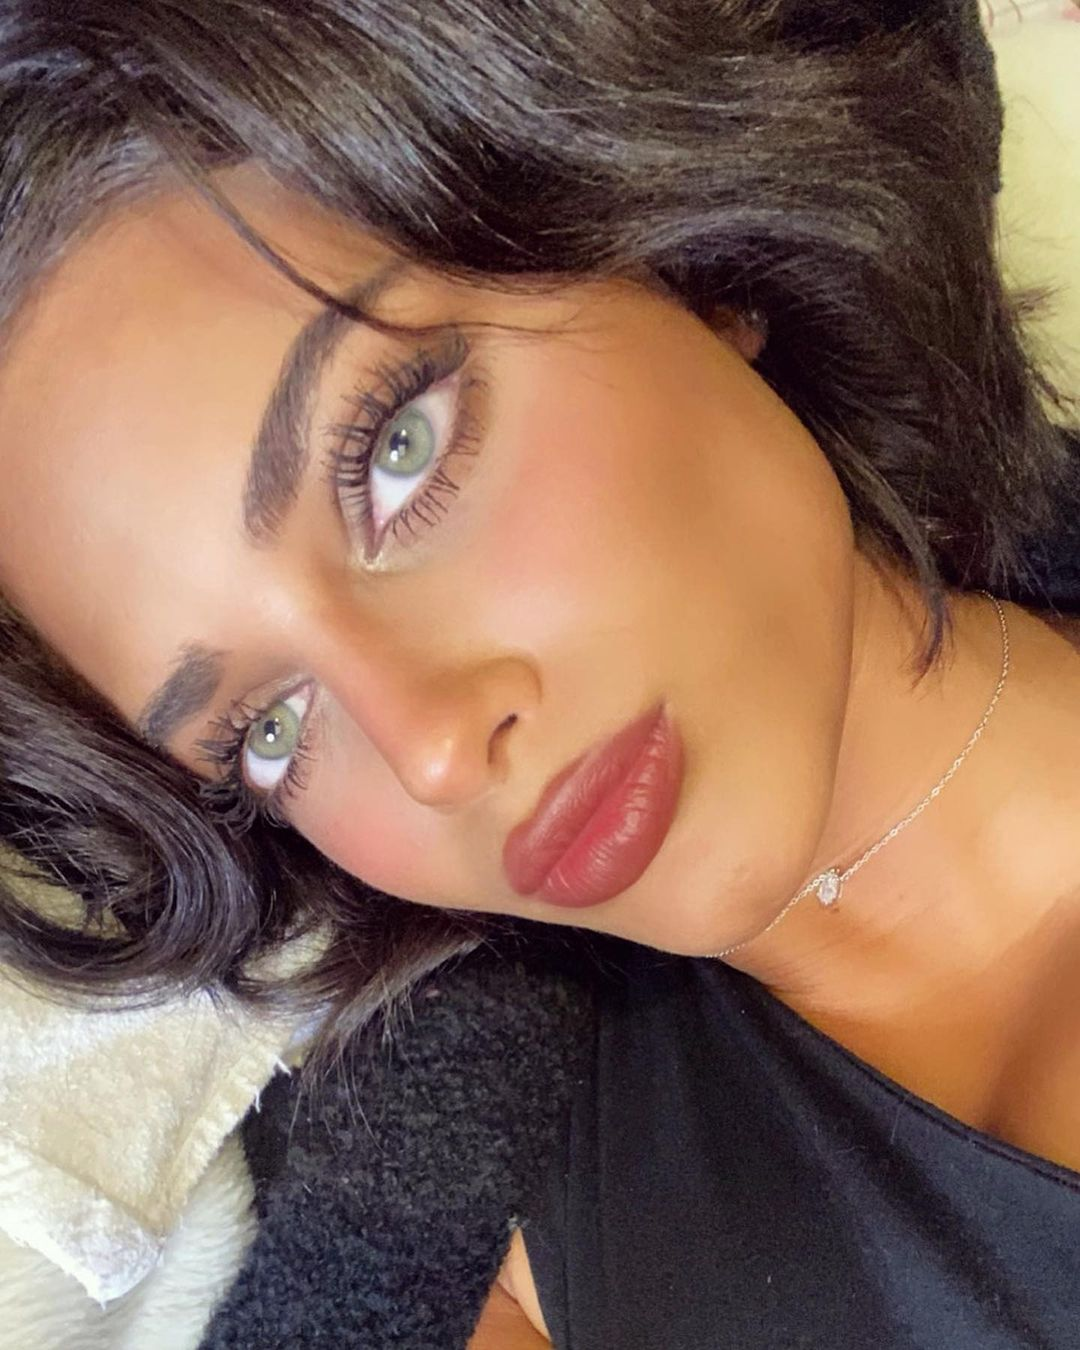 Hiba-Youssef-Wallpapers-Insta-Fit-Bio-4